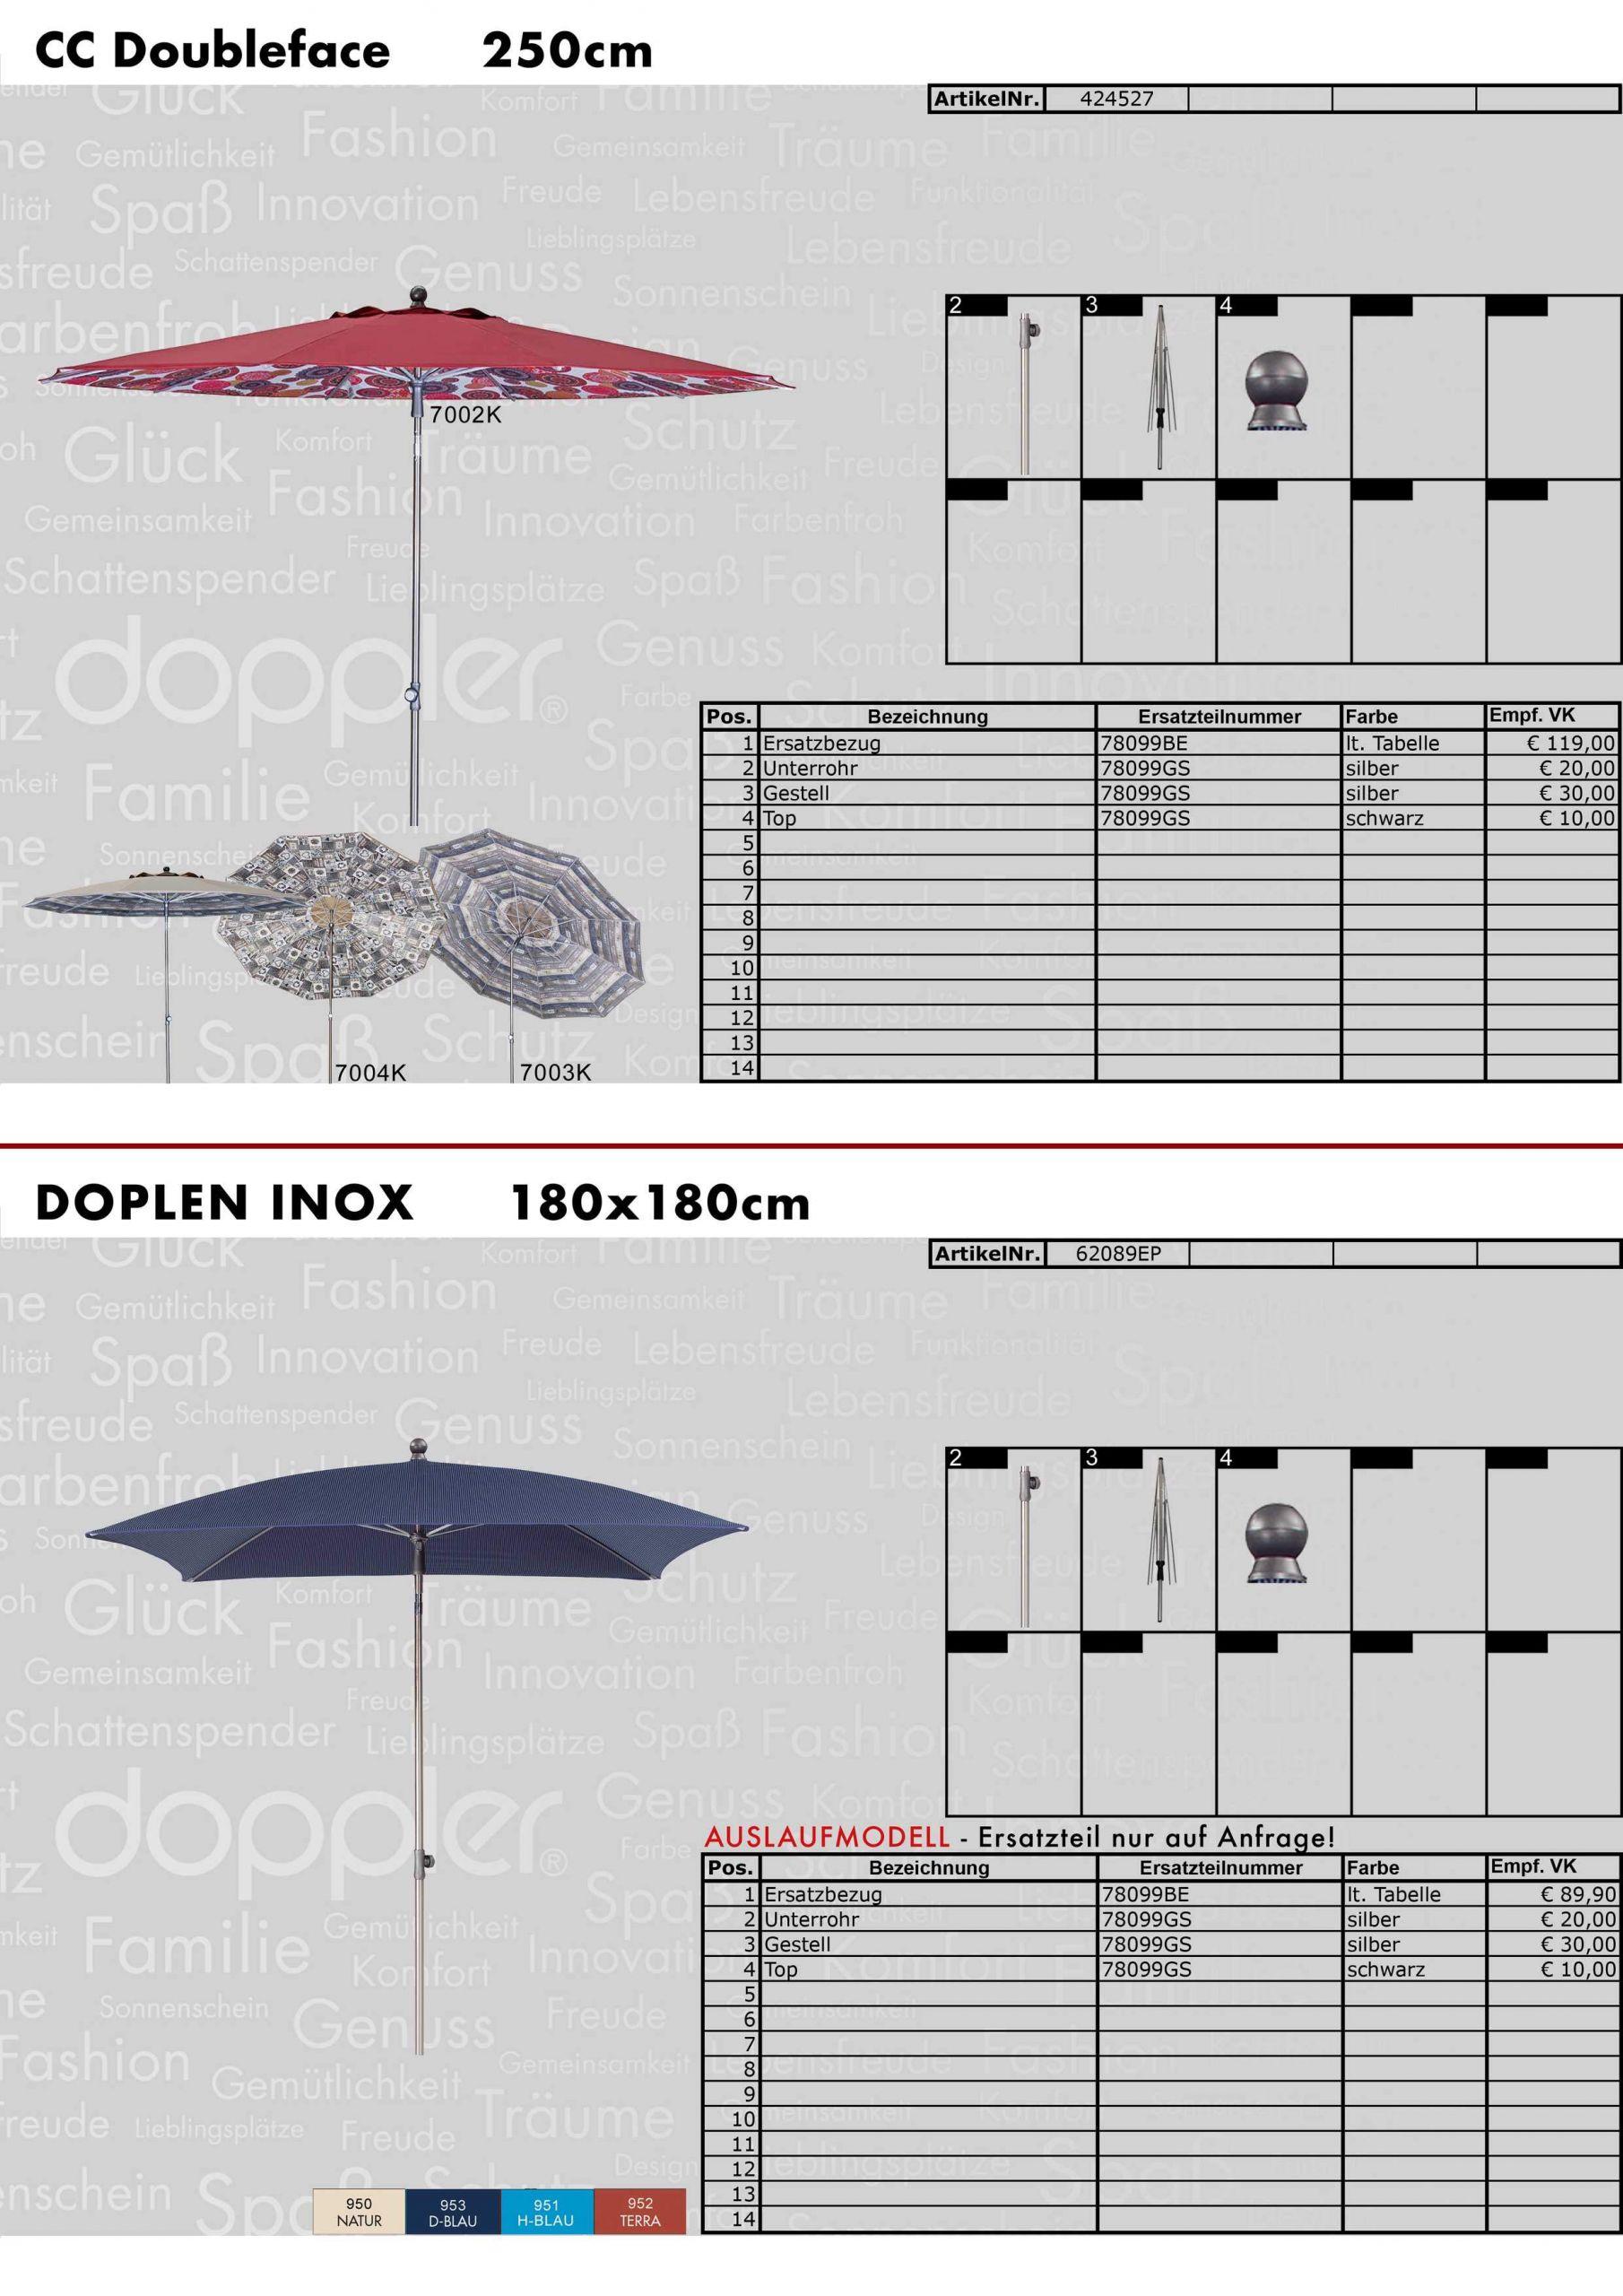 doppler Ersatzteilkatalog 2019 21a Colorcap Doubleface 250 Doplen Inox 180x180